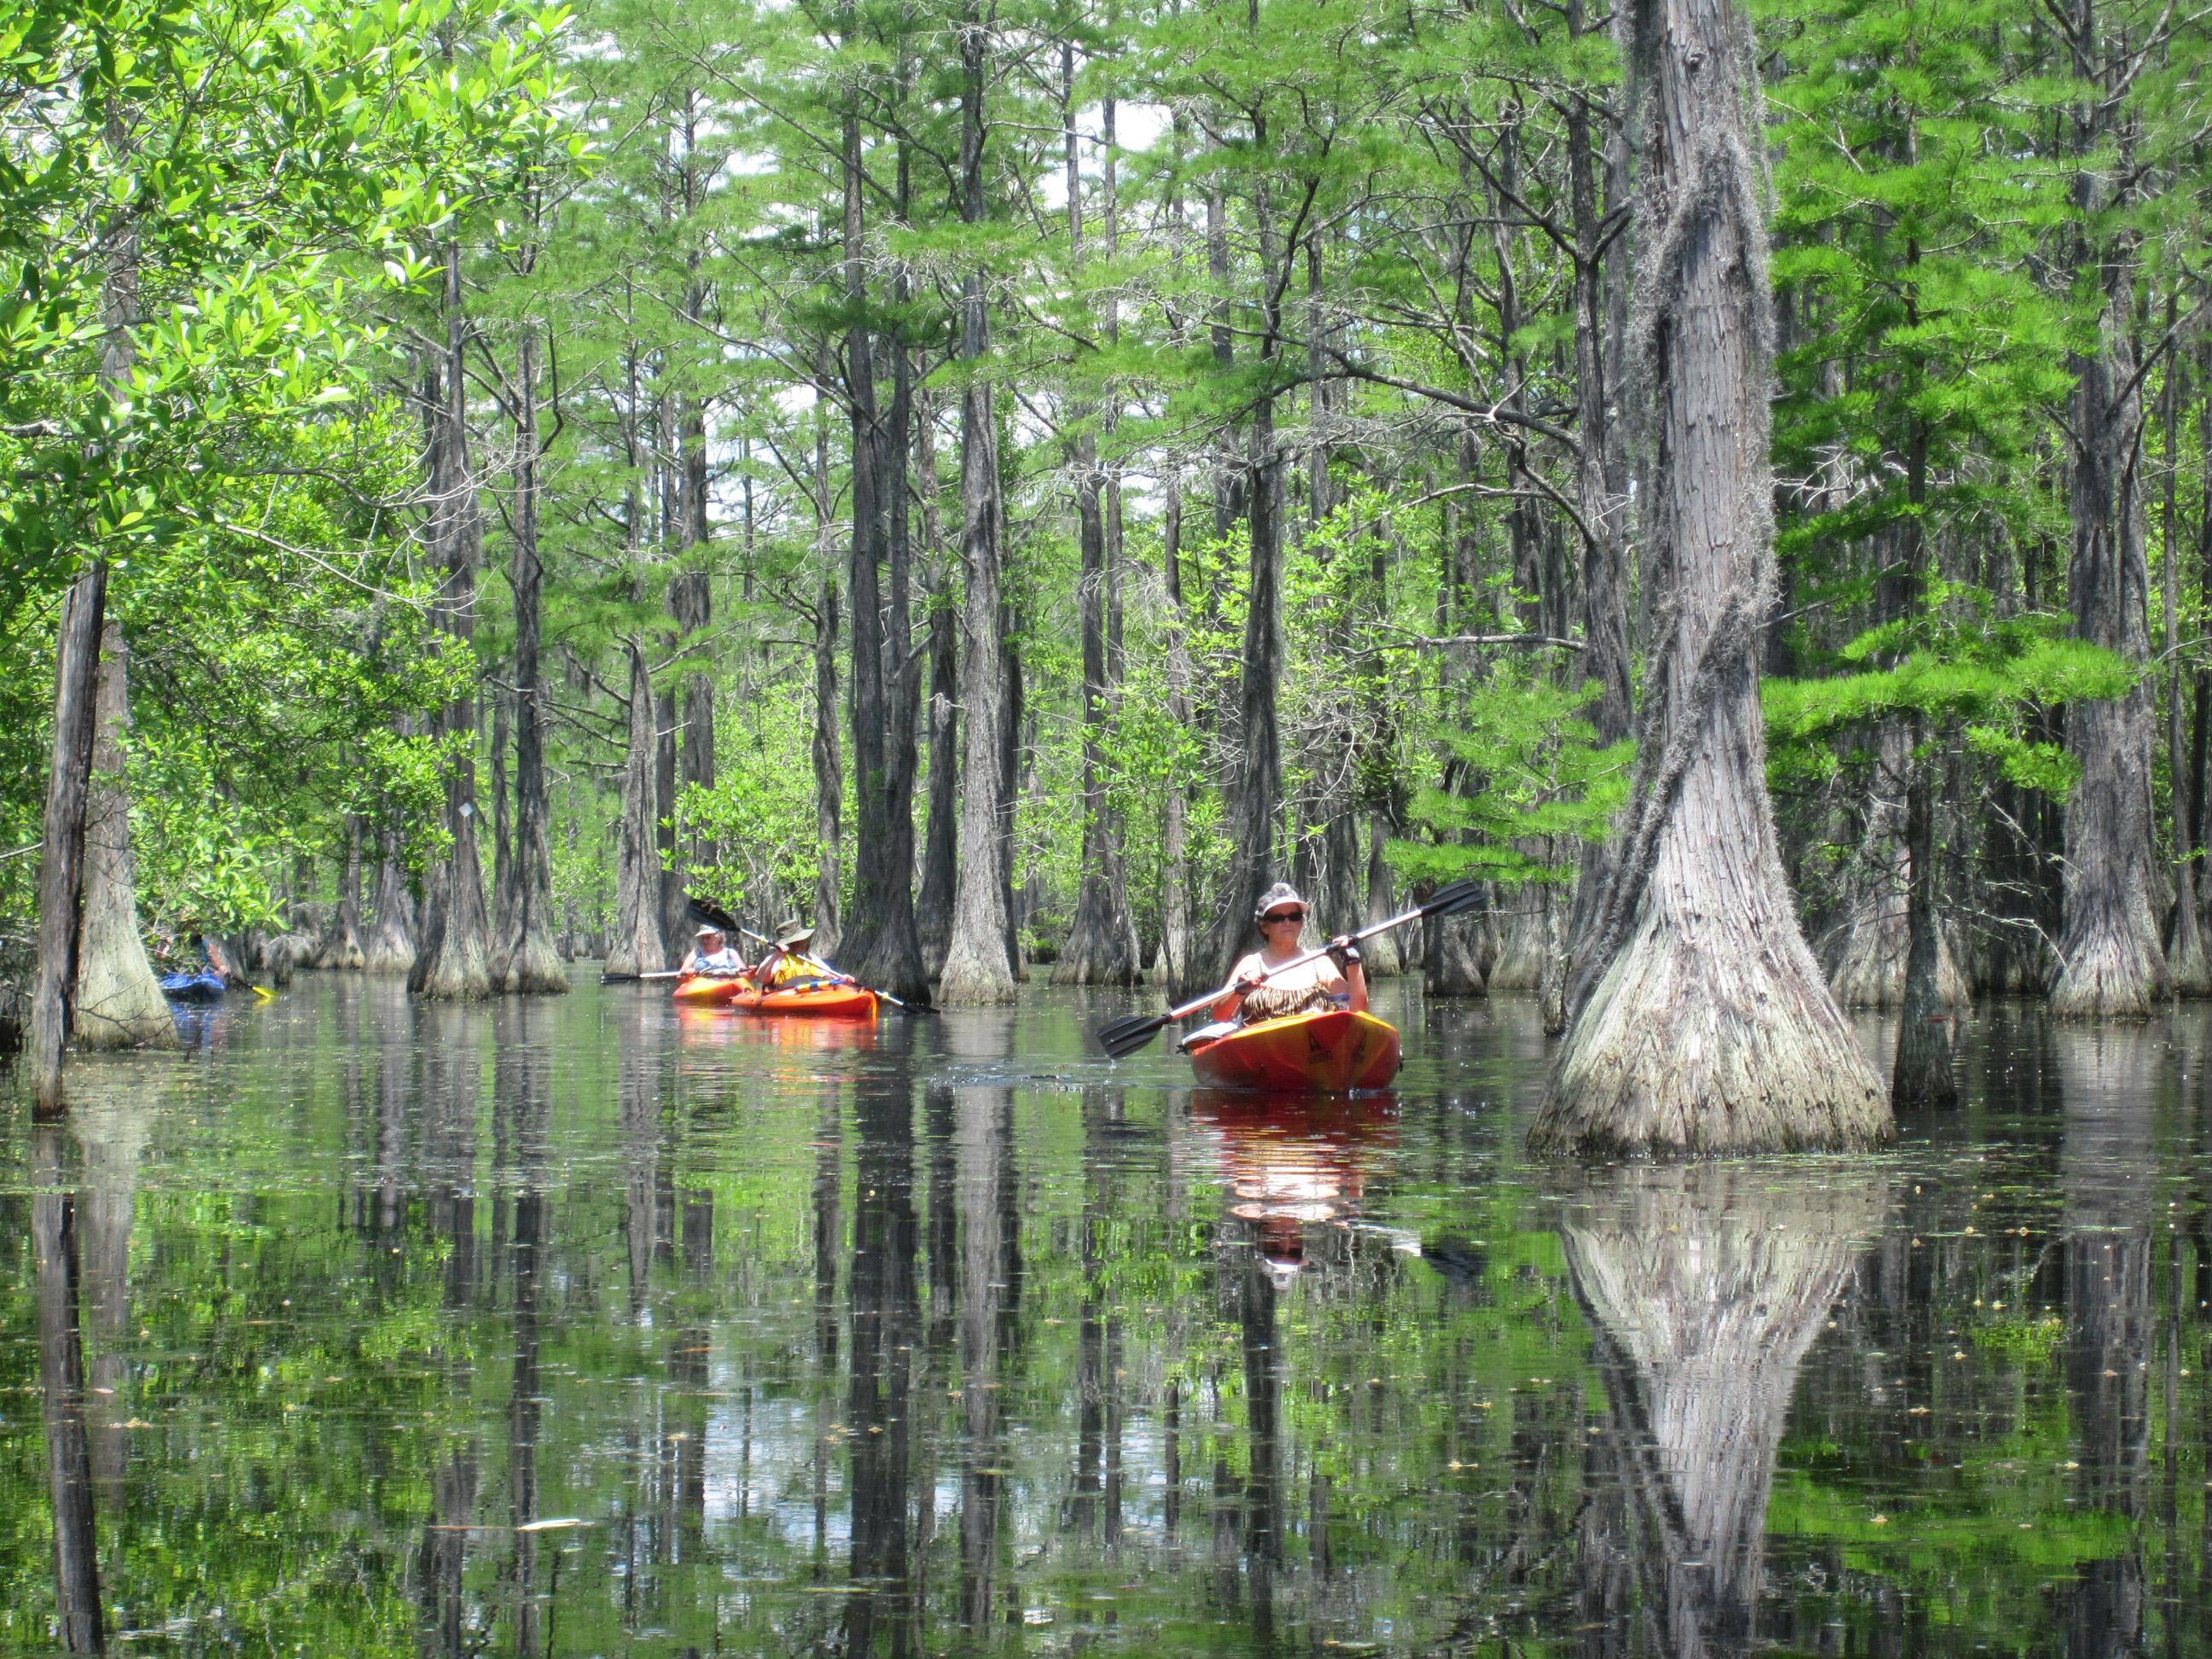 Georgia State Parks Introduces a Spring Break Wildlife Getaway